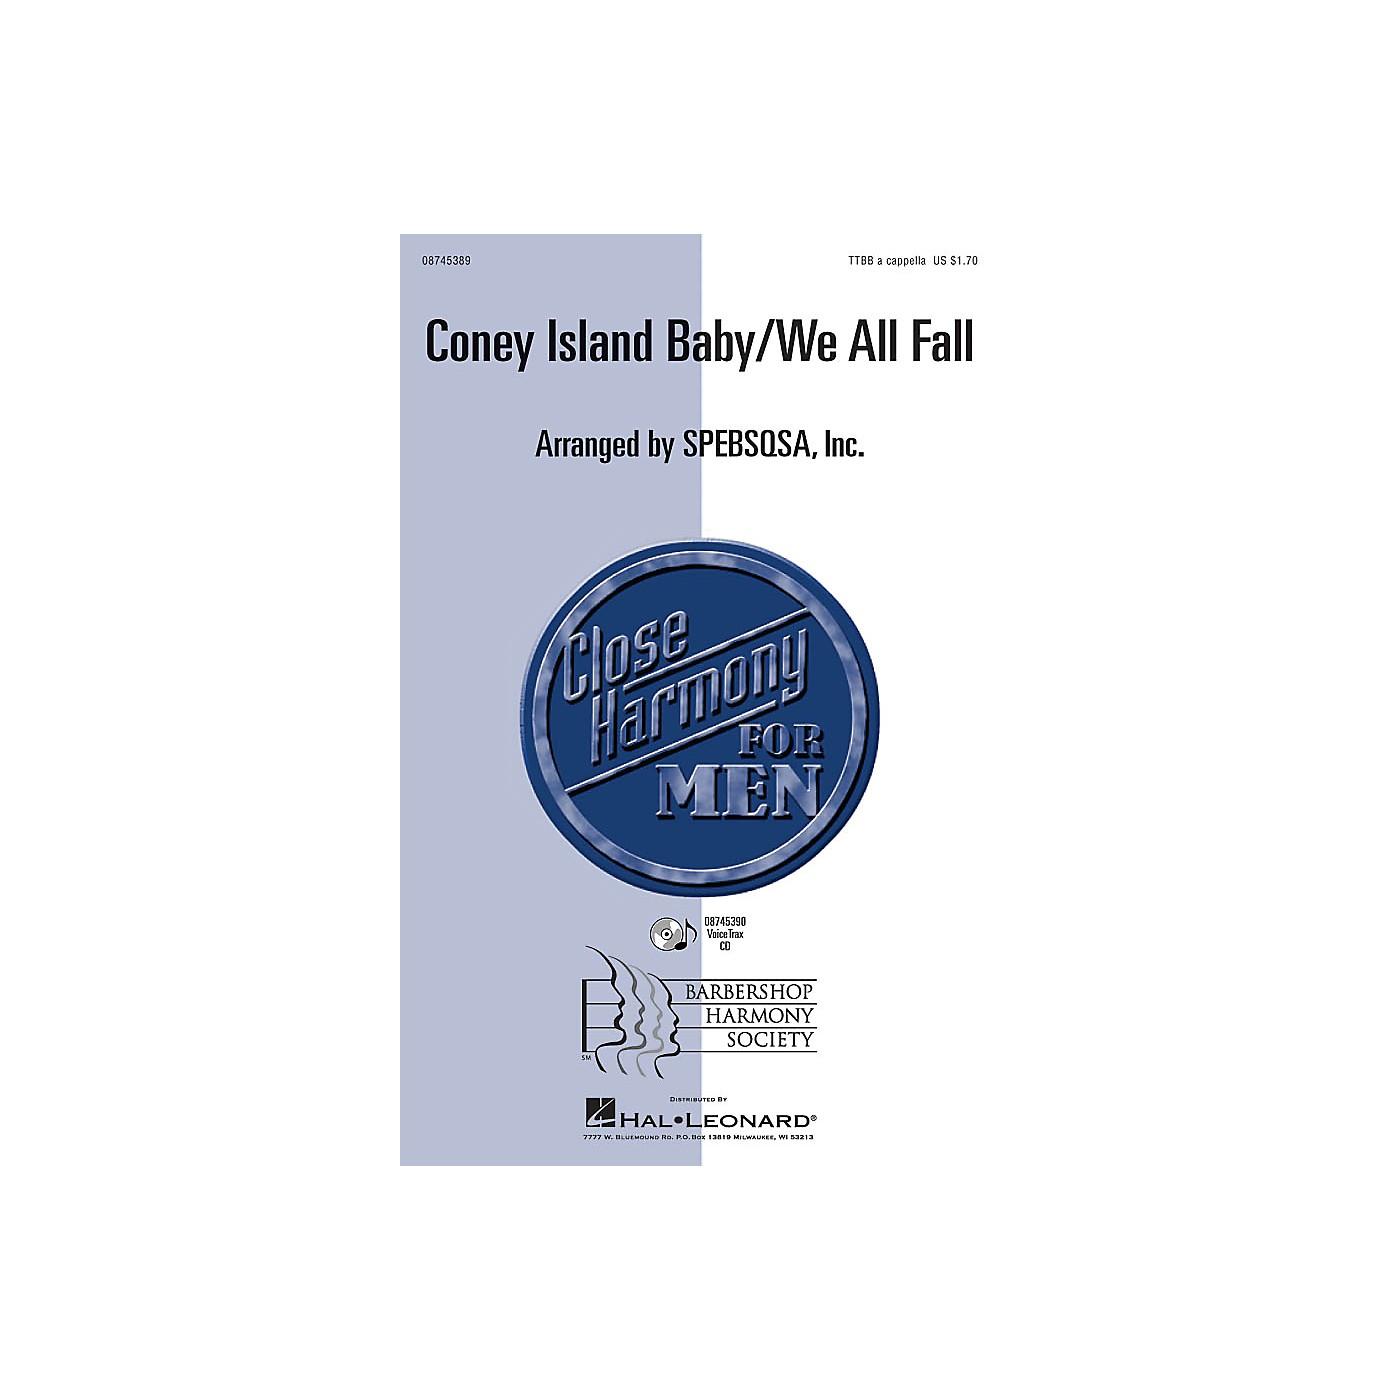 Hal Leonard Coney Island Baby/We All Fall TTBB A Cappella arranged by SPEBSQSA, Inc. thumbnail